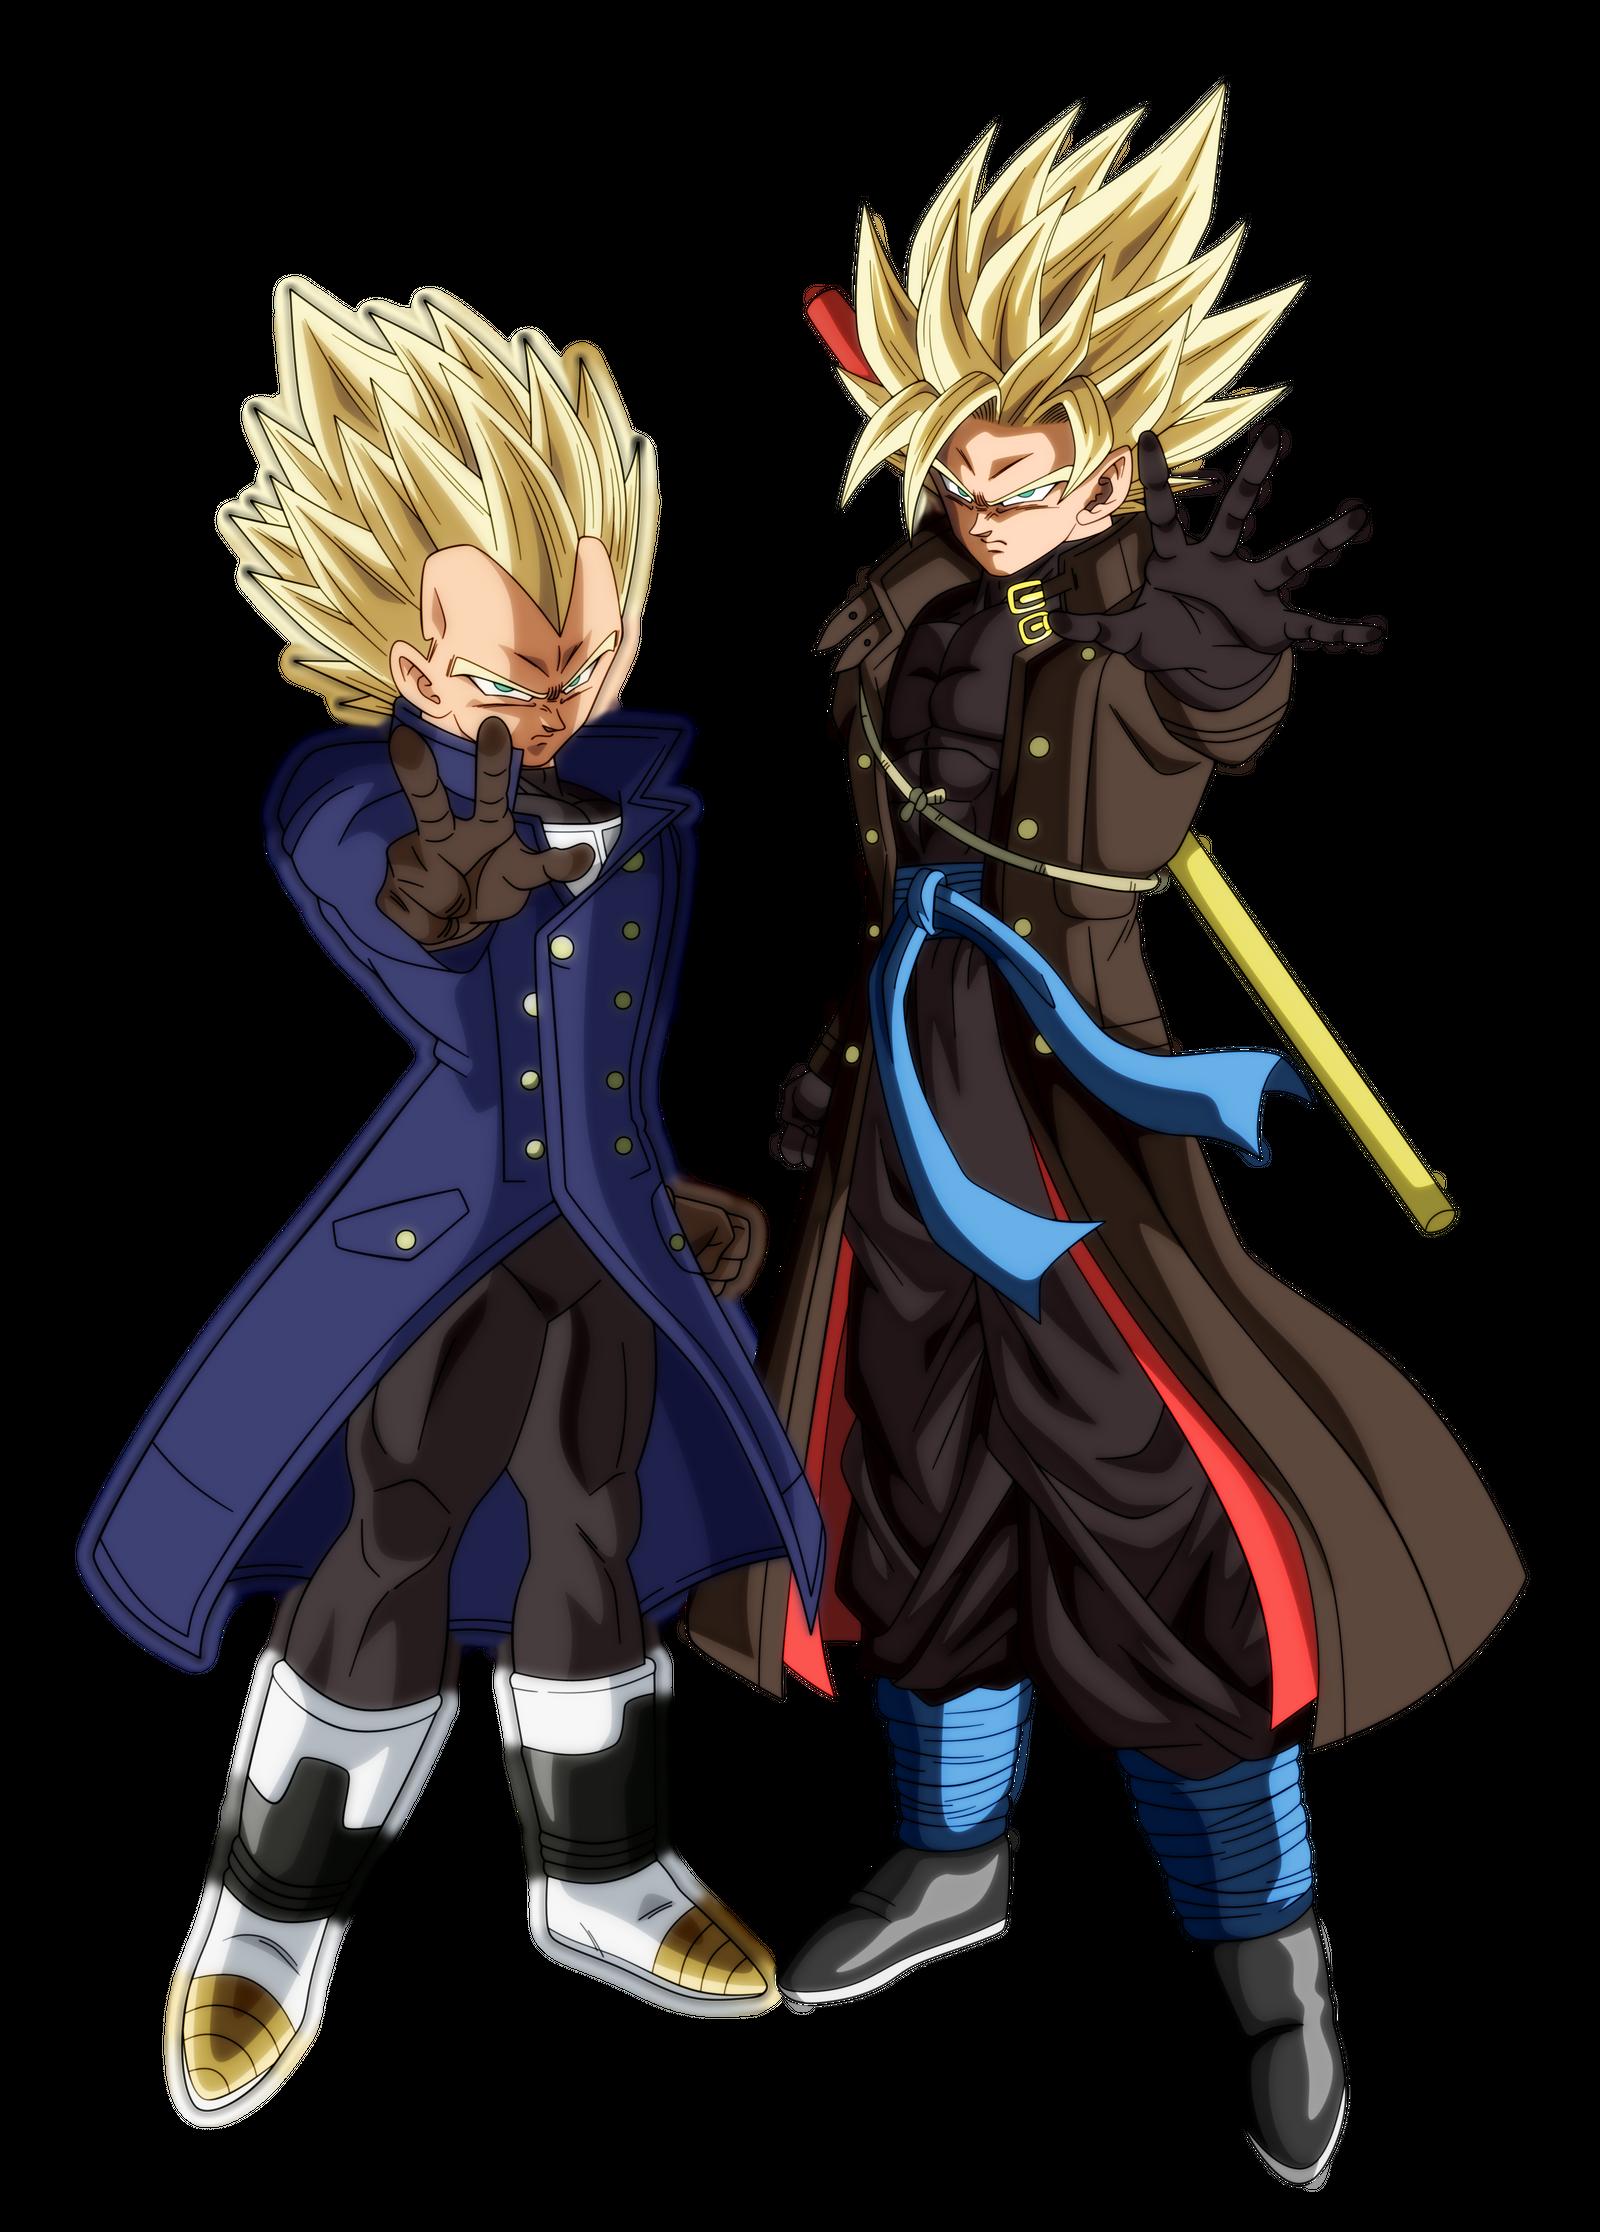 Goku Vegeta Xeno Ssj2 By Andrewdb13 On Deviantart Dragon Ball Super Goku Dragon Ball Super Manga Anime Dragon Ball Super